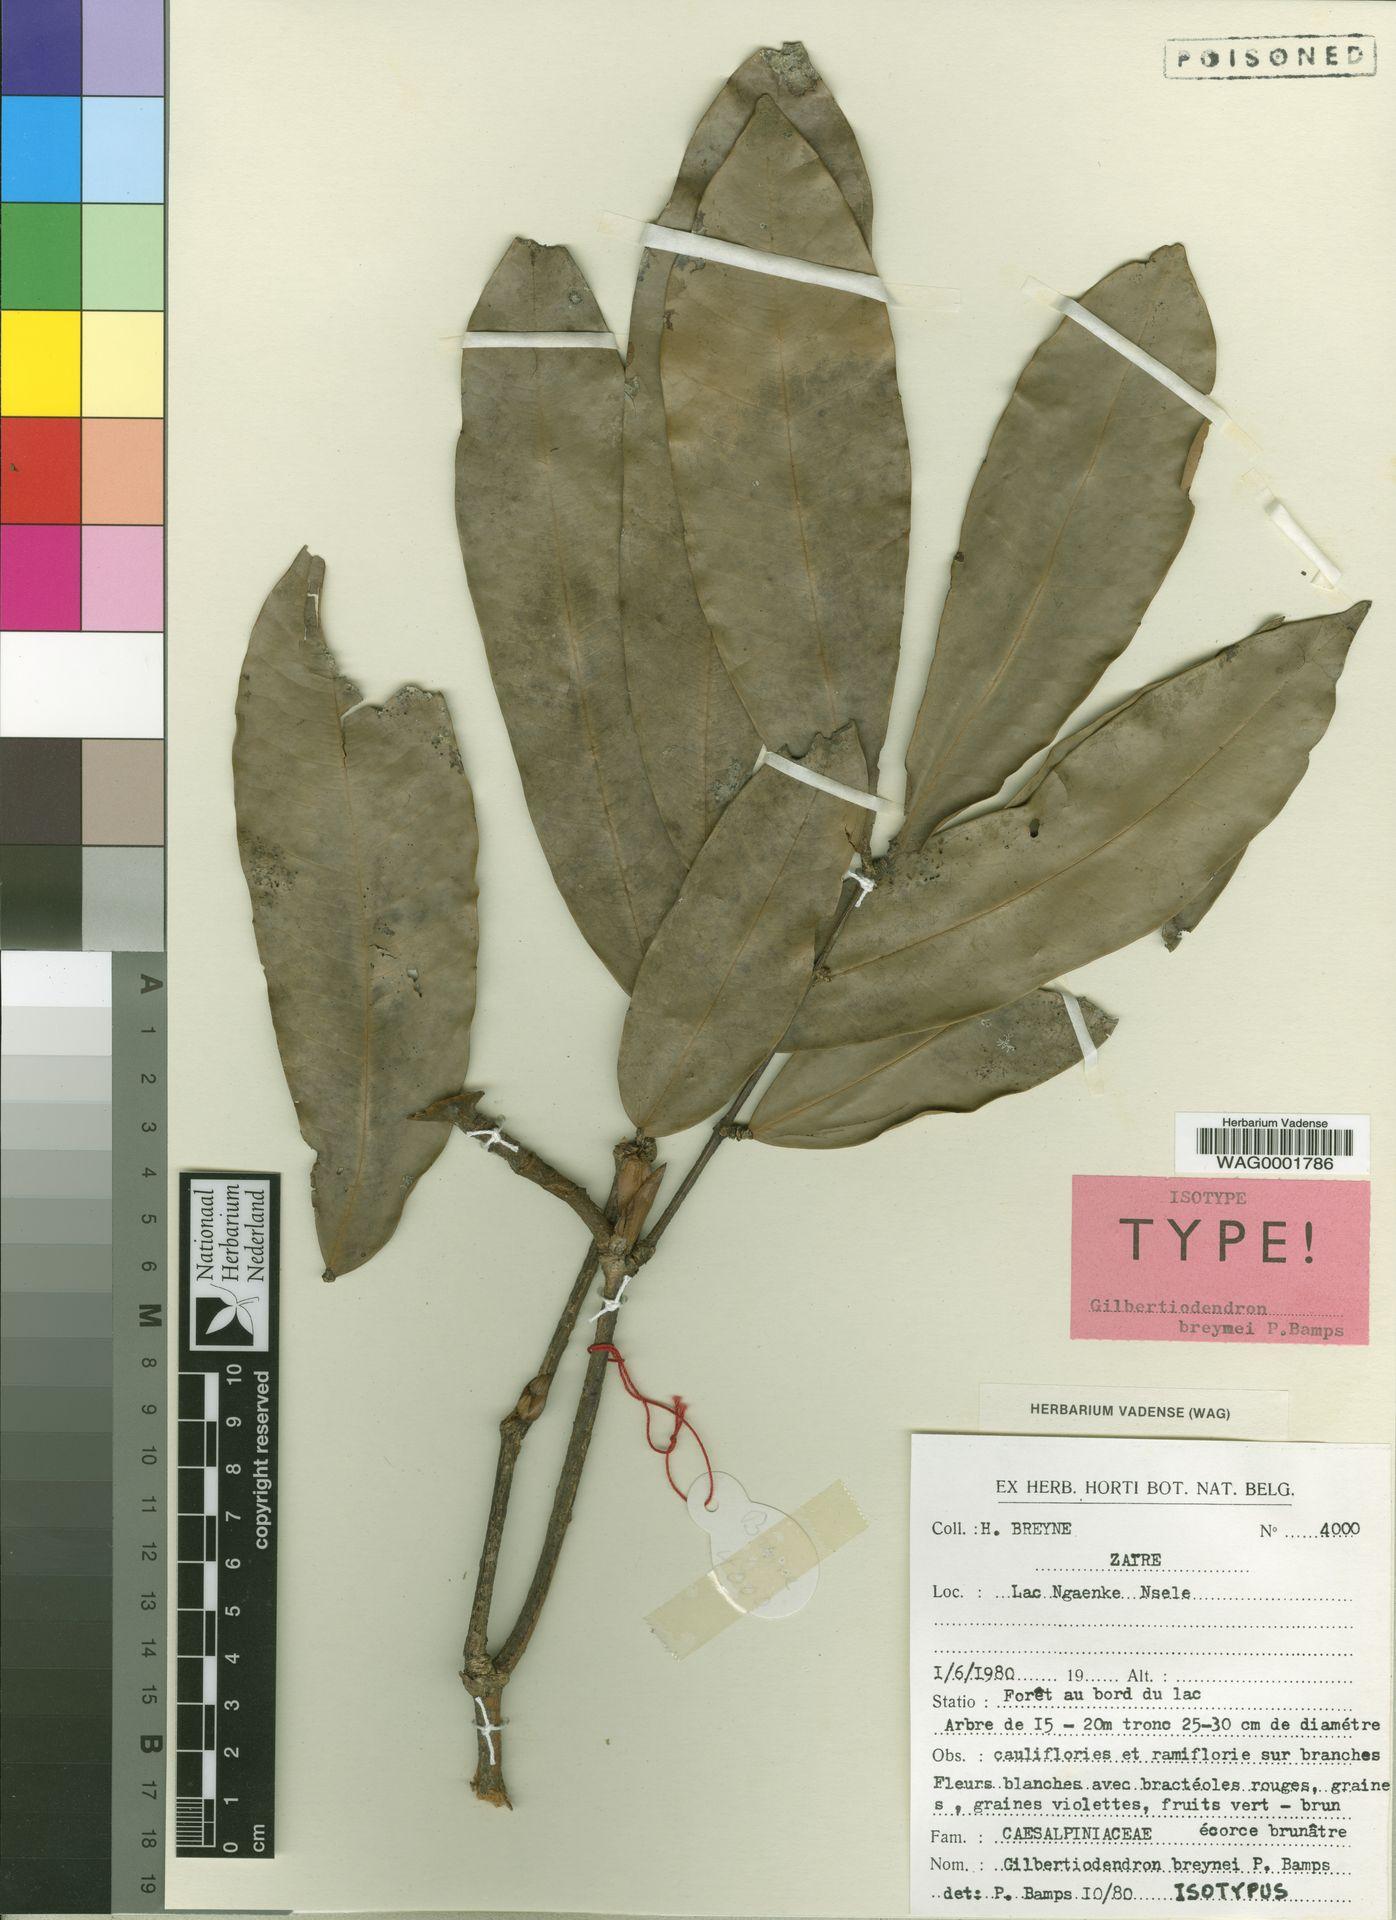 WAG0001786   Gilbertiodendron breynei Bamps